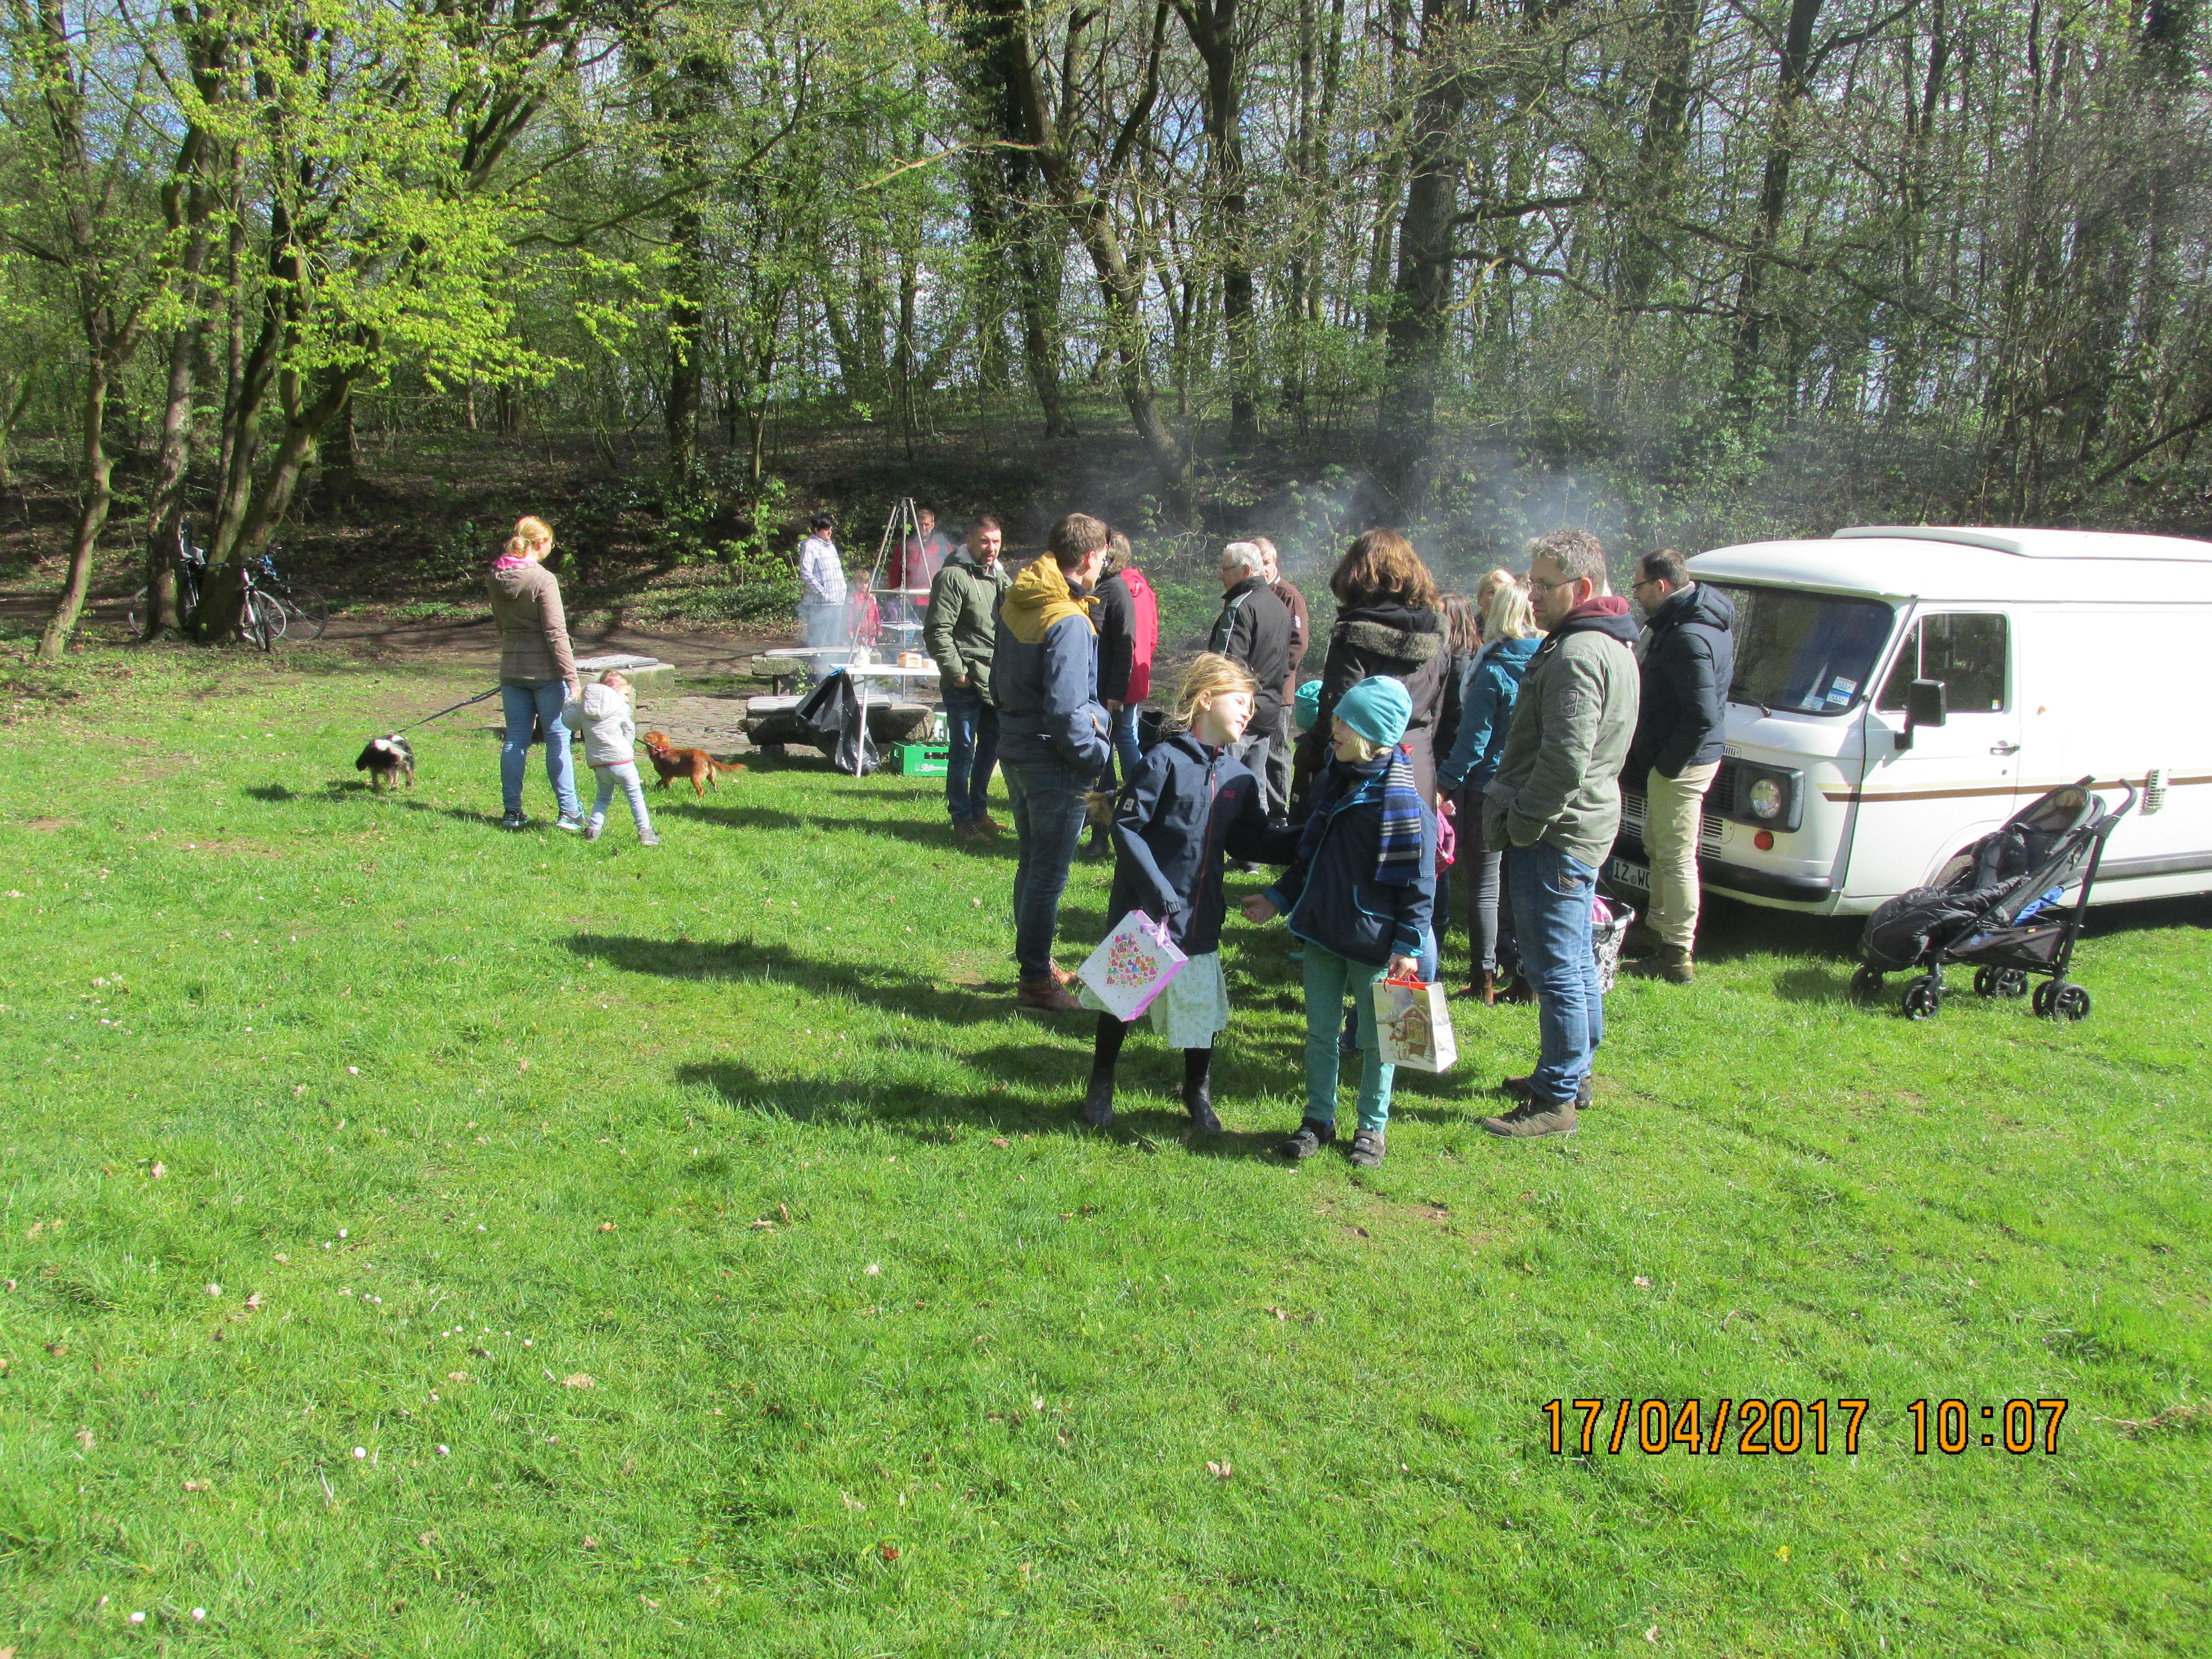 Veranstaltungen - BFK - Bürger für Kellinghusen